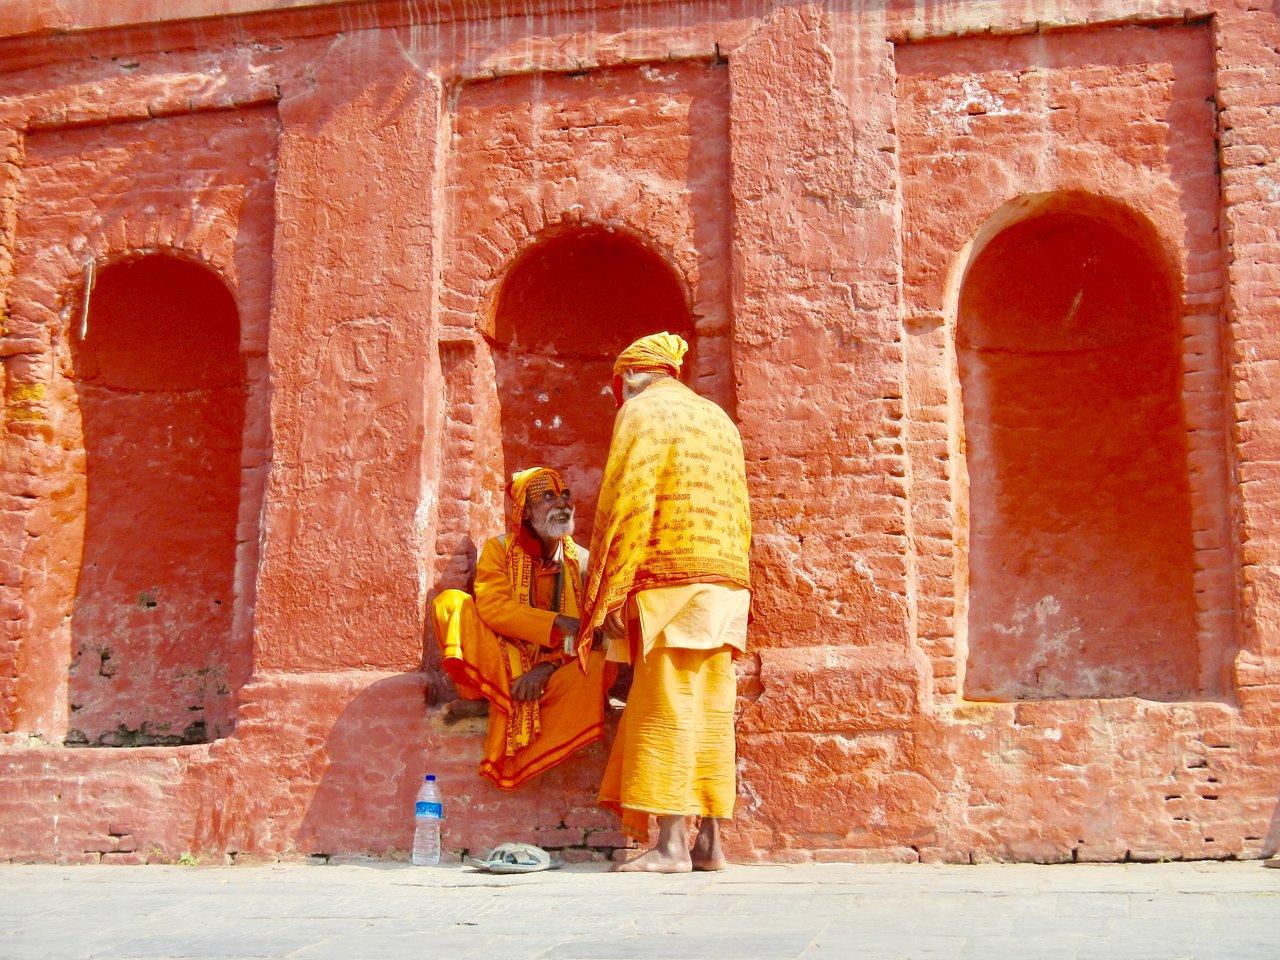 Hindu Priest at Pashupatinath Temple Kathmandu Photo taken by Greg C